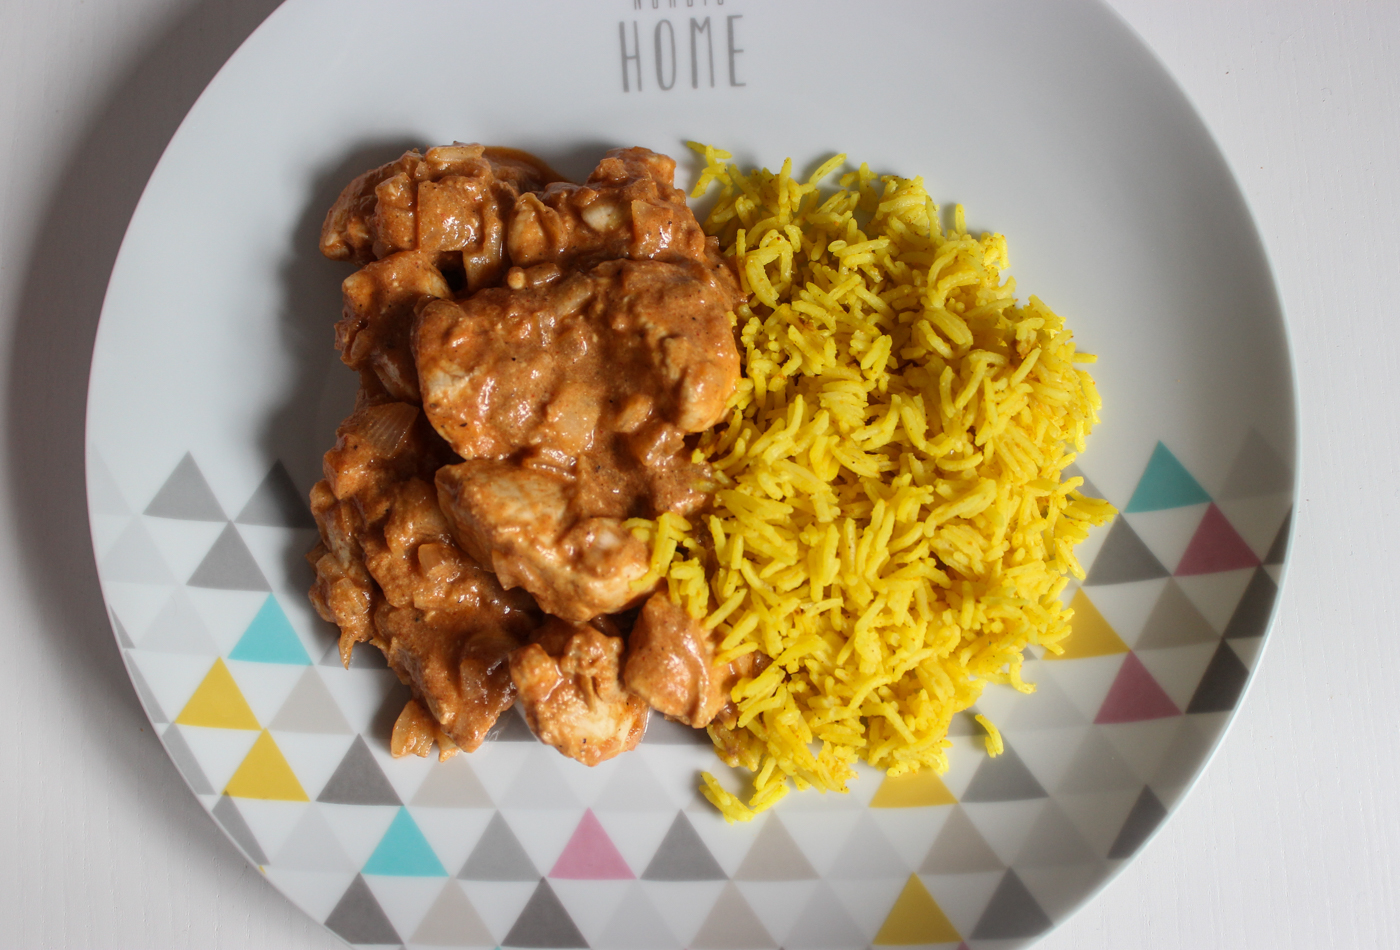 Mi versión del pollo tikka masala con arroz basmati - oieryus ...